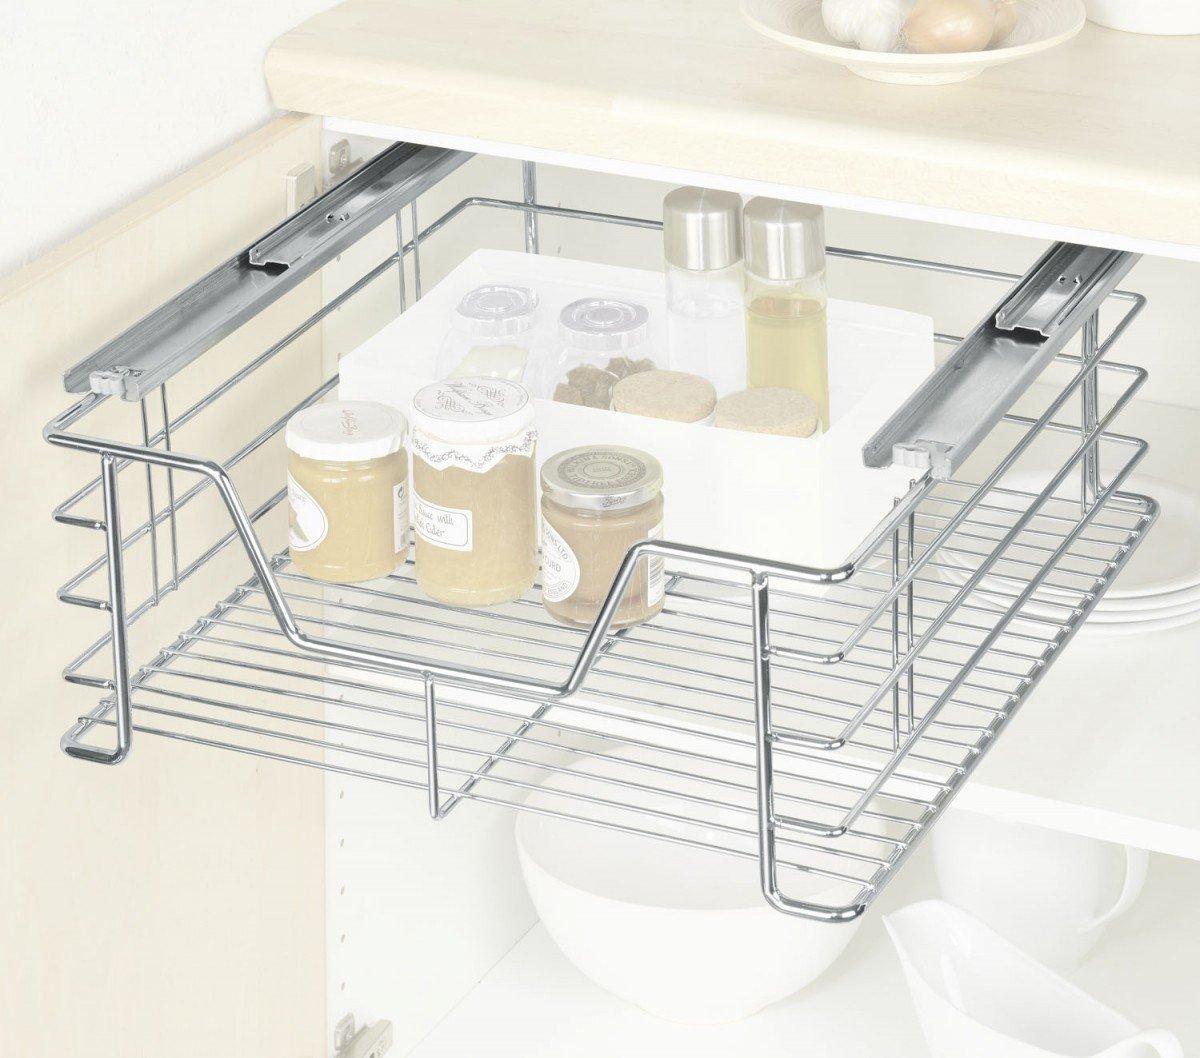 Wenko 5911500 - Cesto extraíble para armarios de cocina (tamaño ...